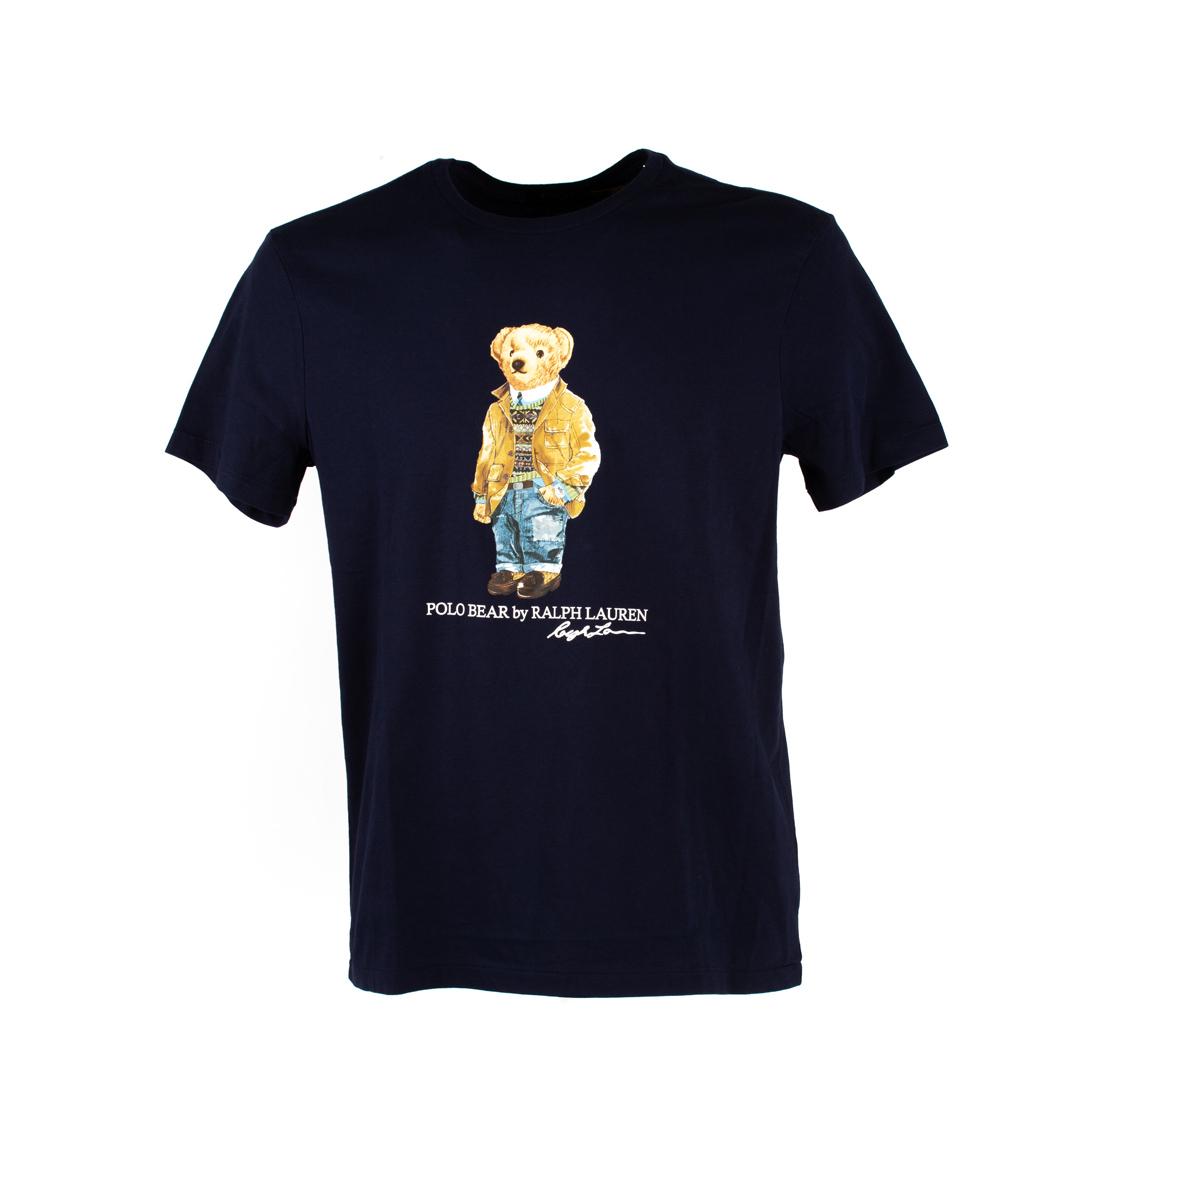 T-Shirt Polo Ralph Lauren Blu stampa orsetto